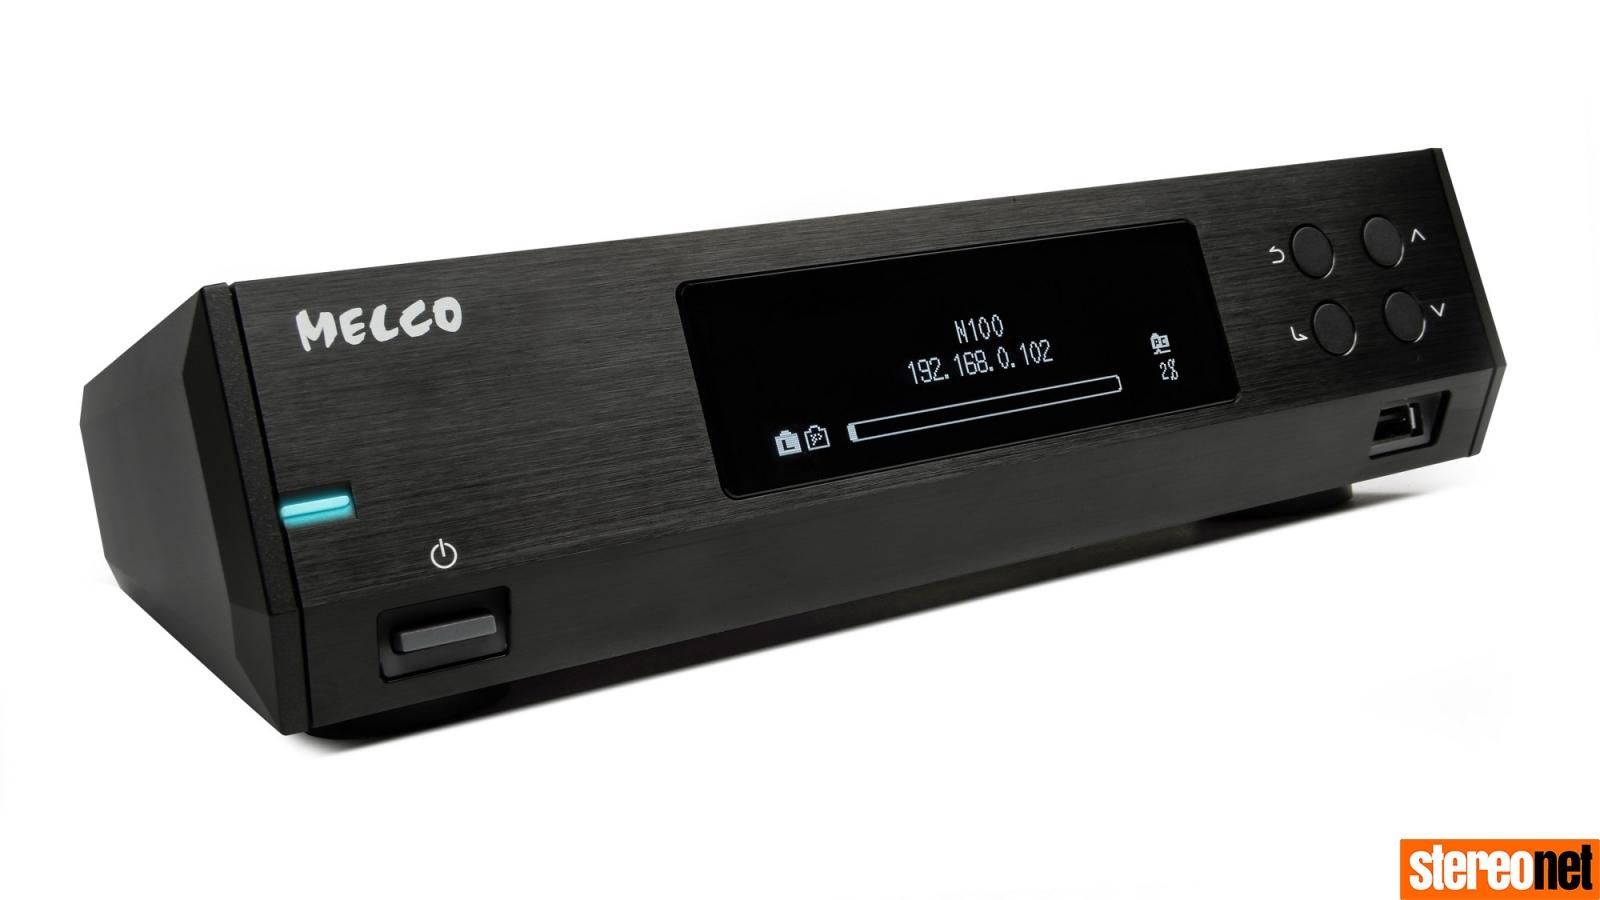 Melco N100-H50